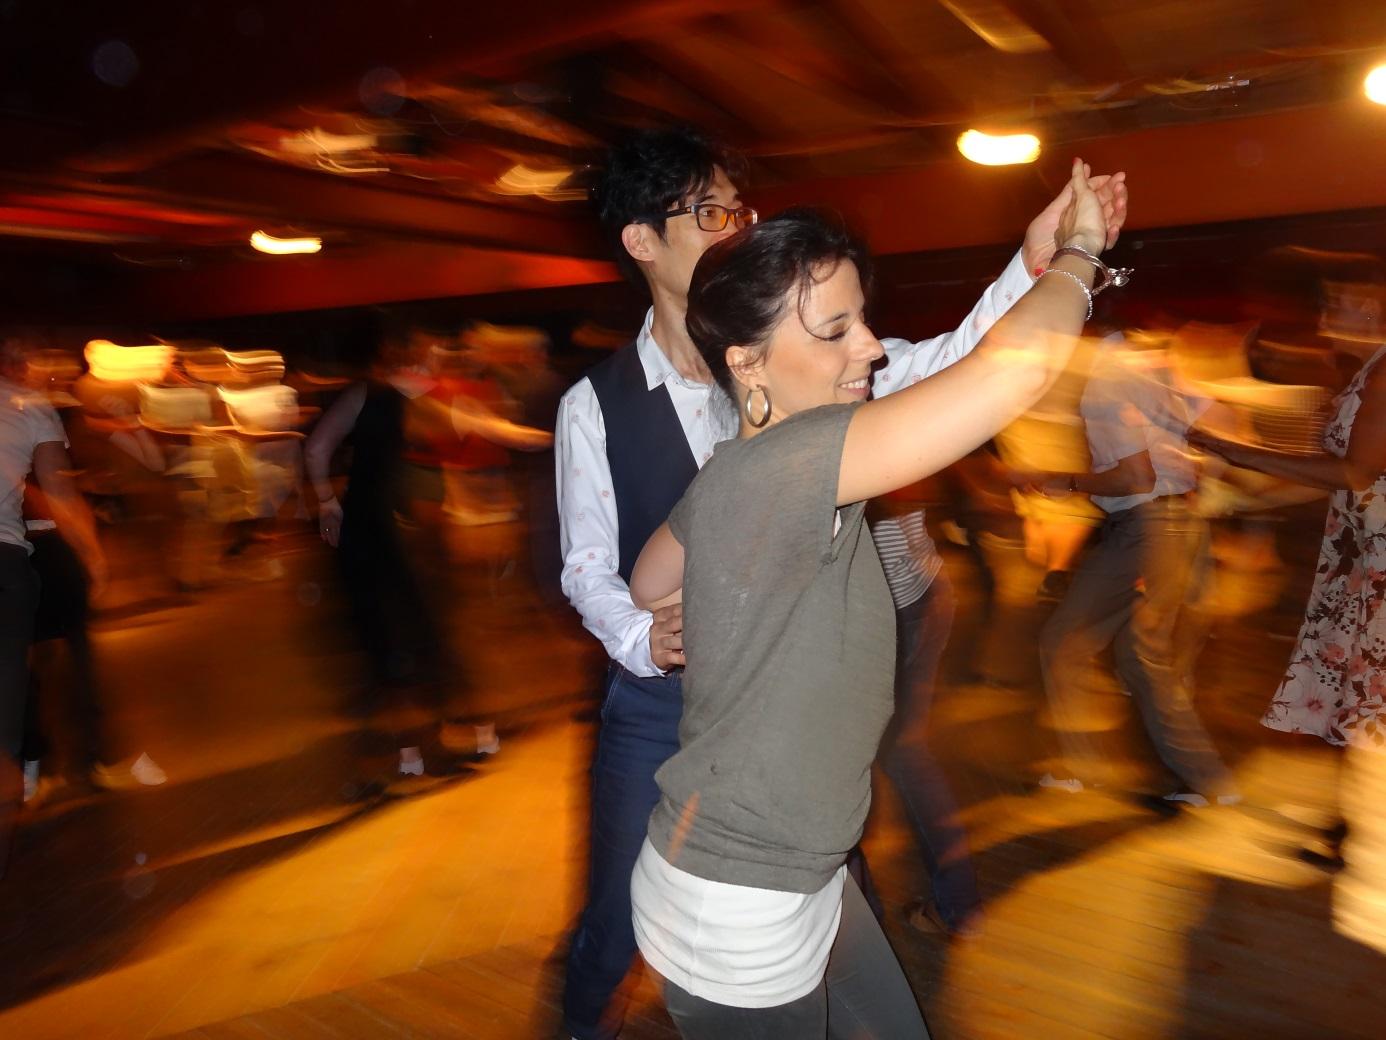 Danse à 2